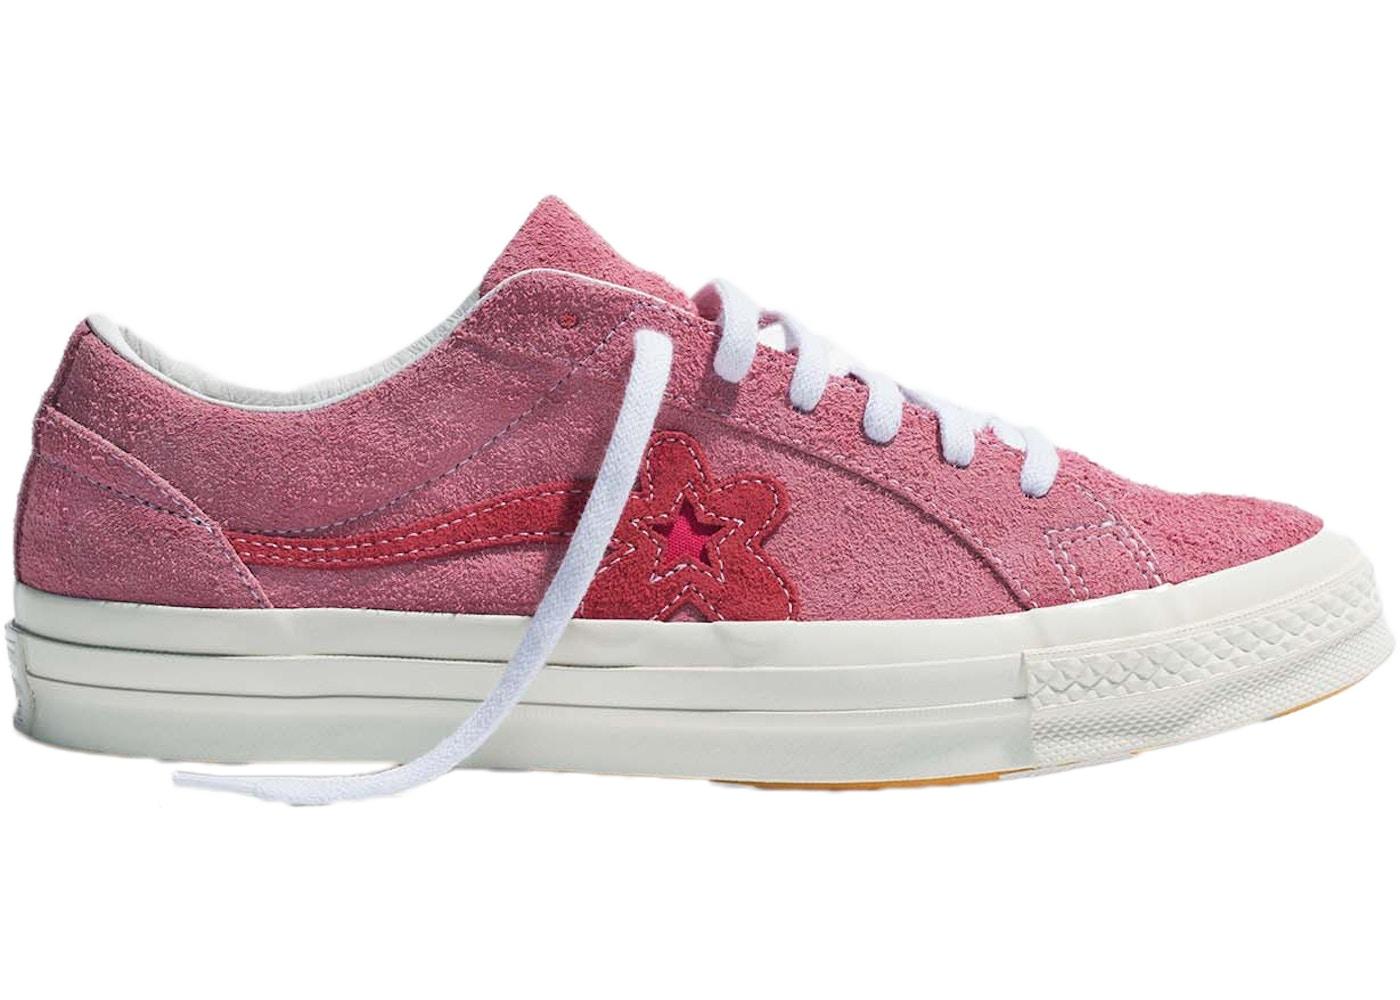 71242cb7cb9ccd Size 6 Footwear - New Highest Bids